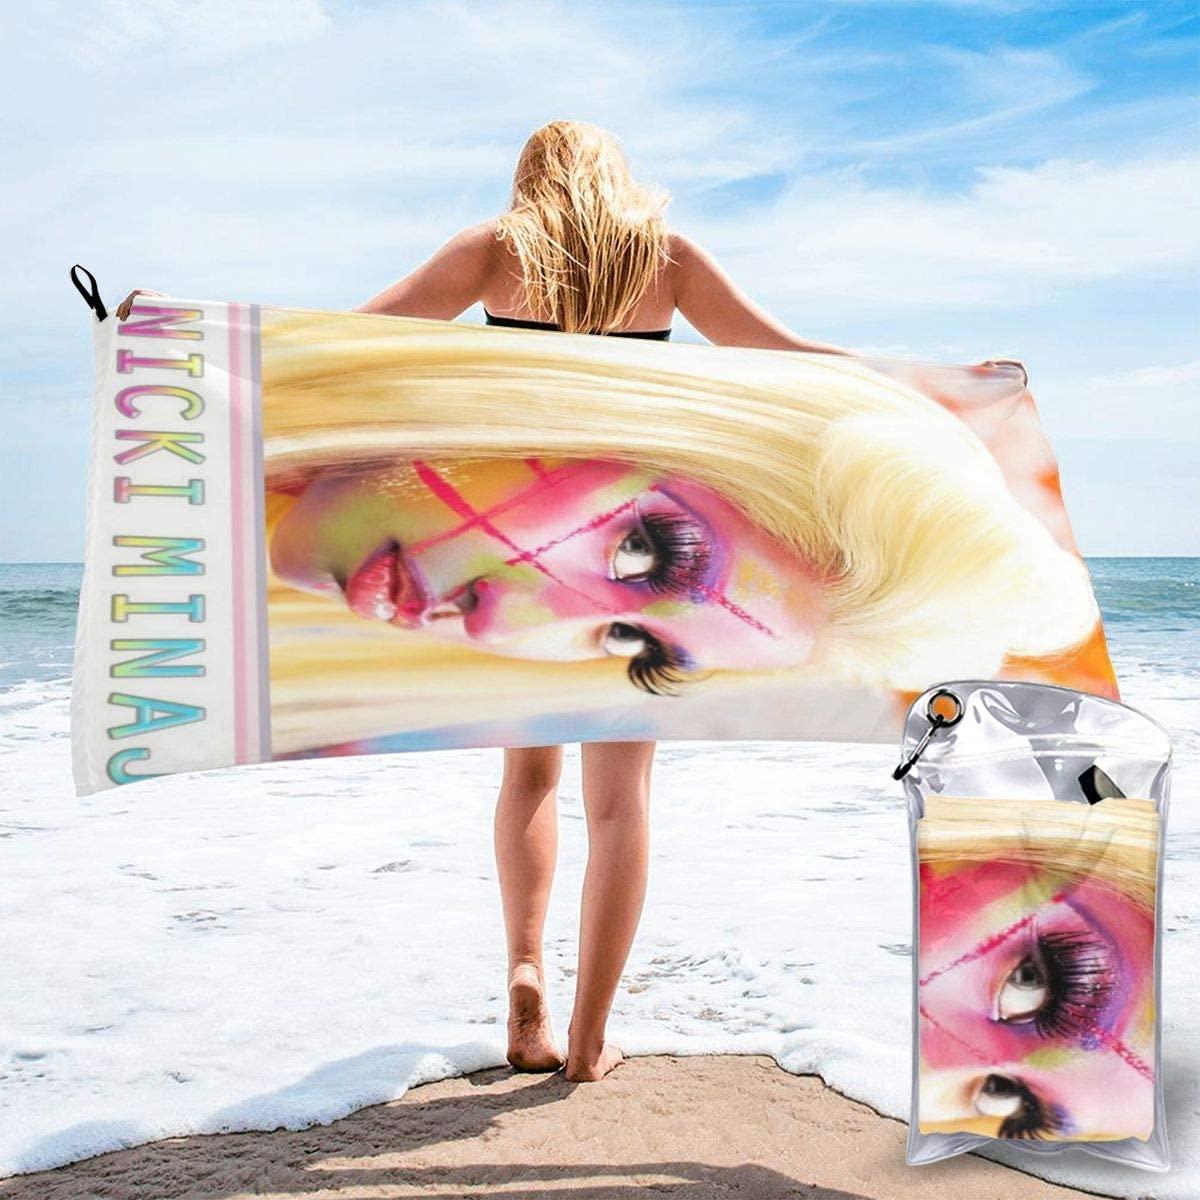 ColletteKMaddox Nicki Minaj Roman Reloaded Quick-Drying Bath Towel Soft Towel, Suitable for Beach, Hotel, Bathroom,Microfiber Towels 27.5X55